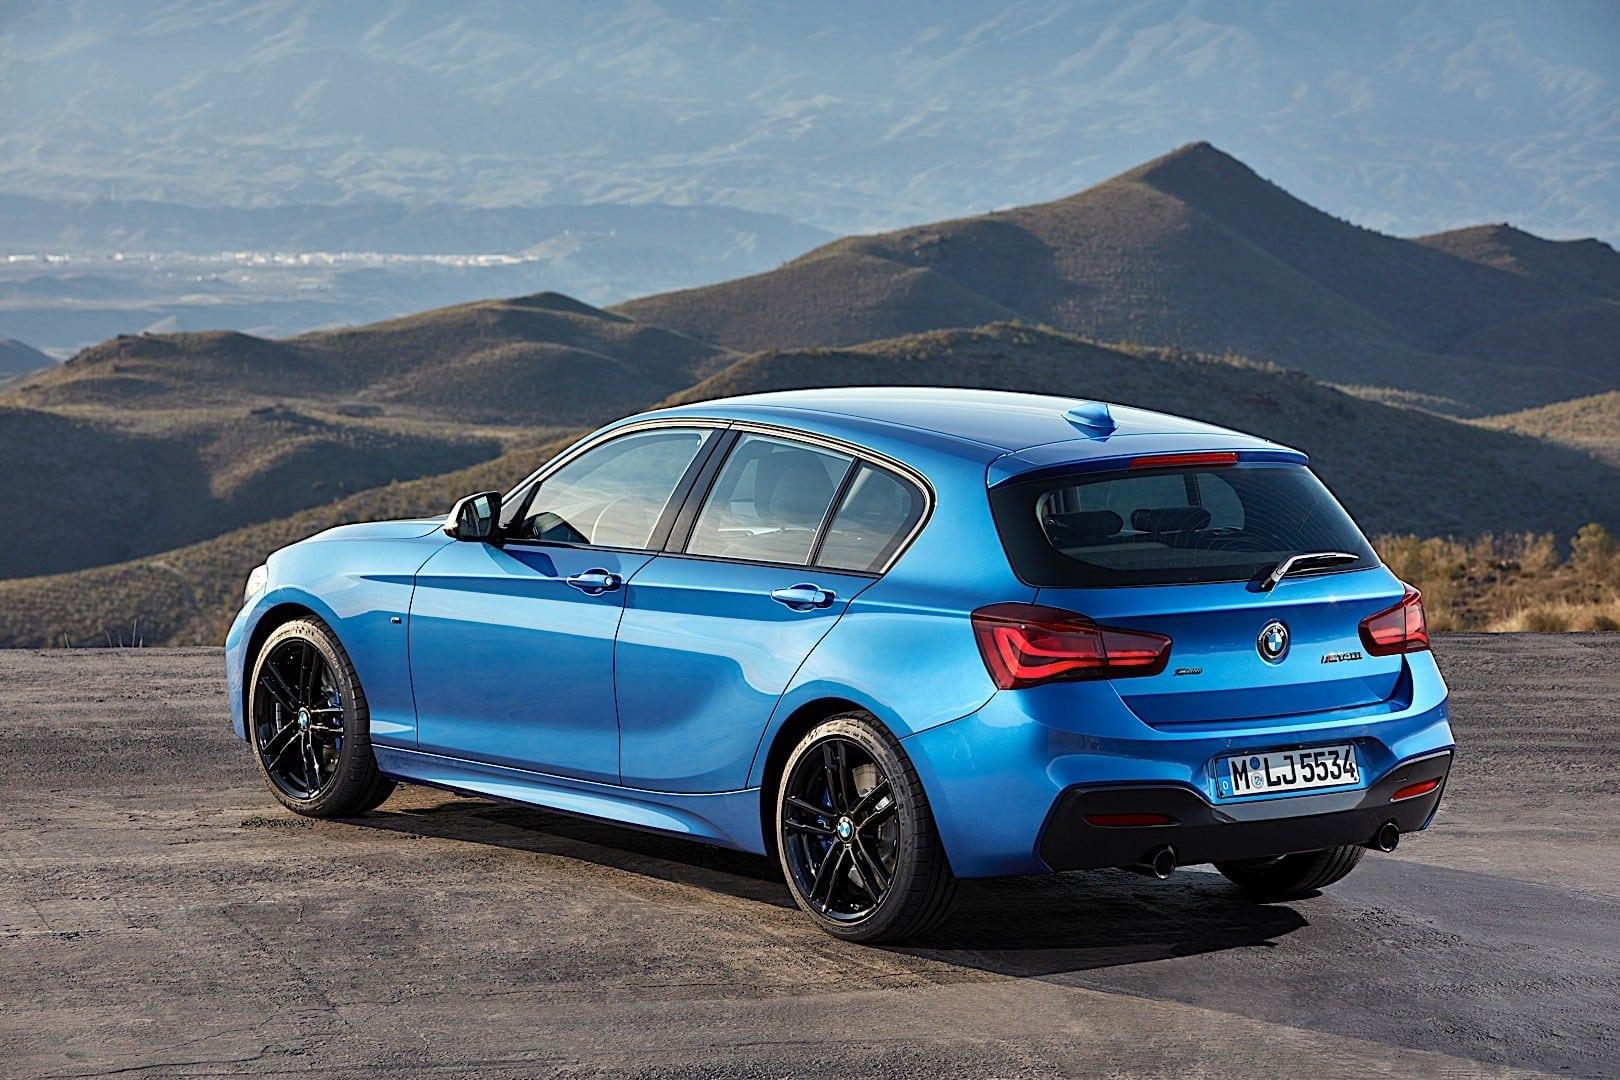 2020 BMW 1 Series Spy Photos